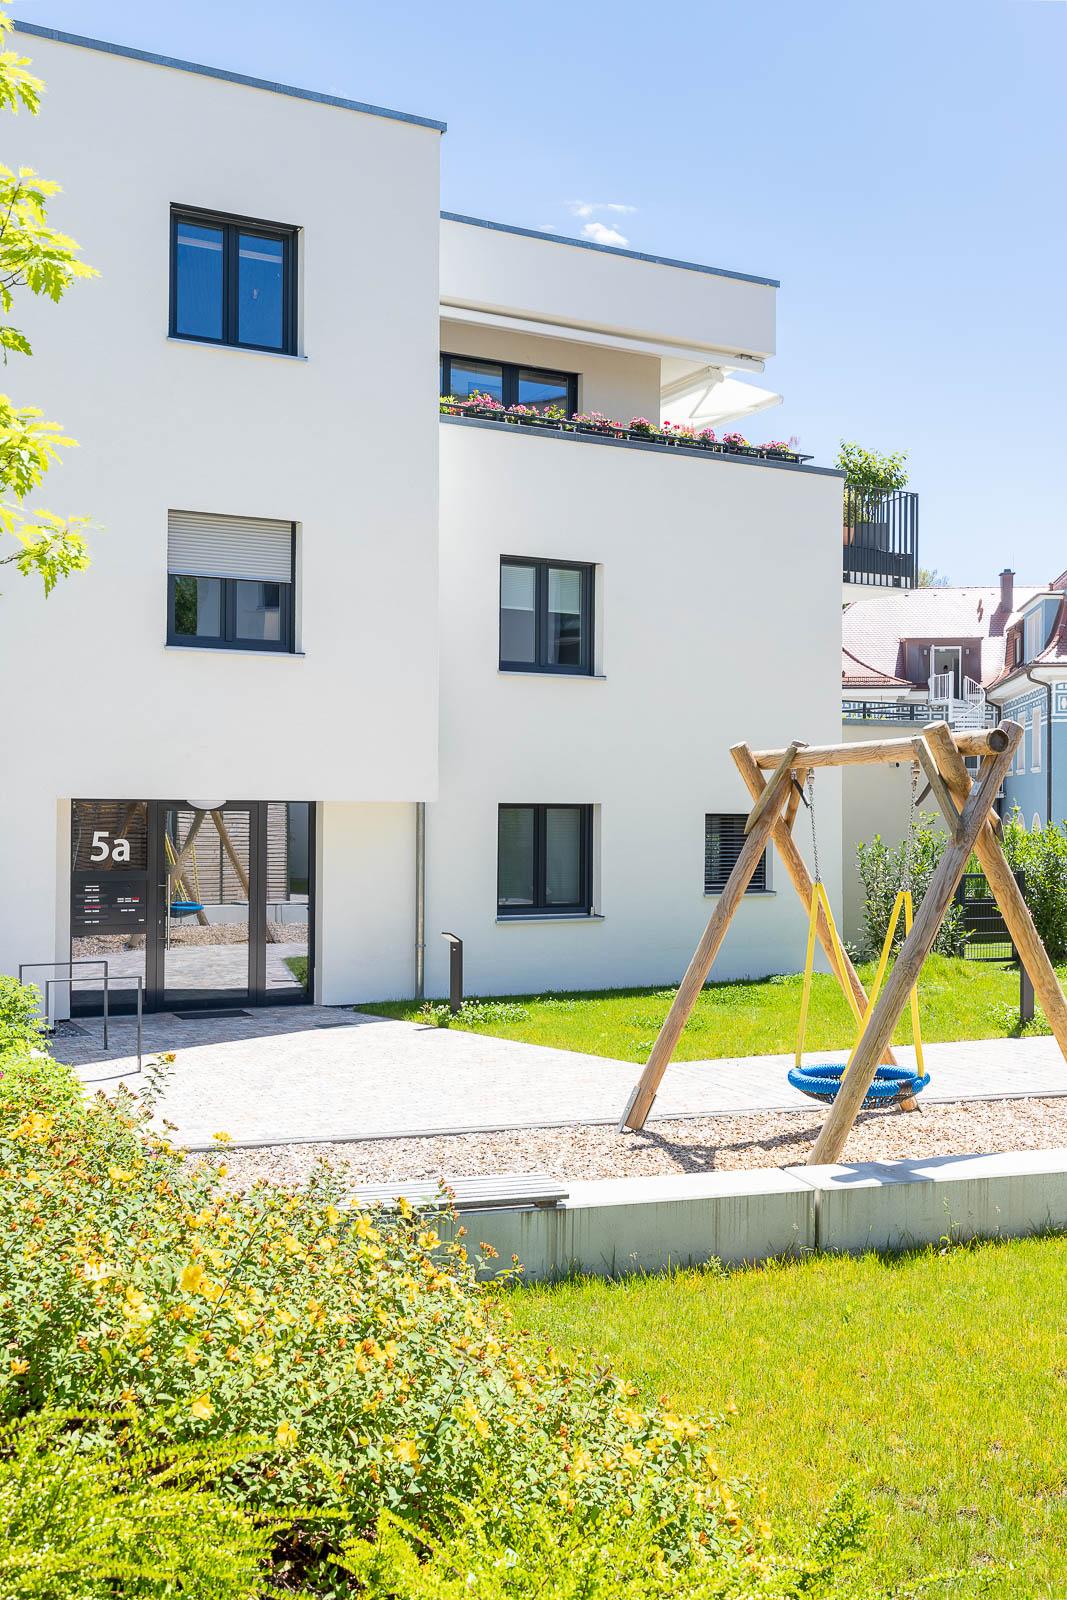 lichtwerk-fotograf-dominik-architekturfotograf-architekturfotografie-immobilienfotograf-immobilienfotograf-immobilienfotografie-sackmann-fotografie-freiburg-kirchzarten